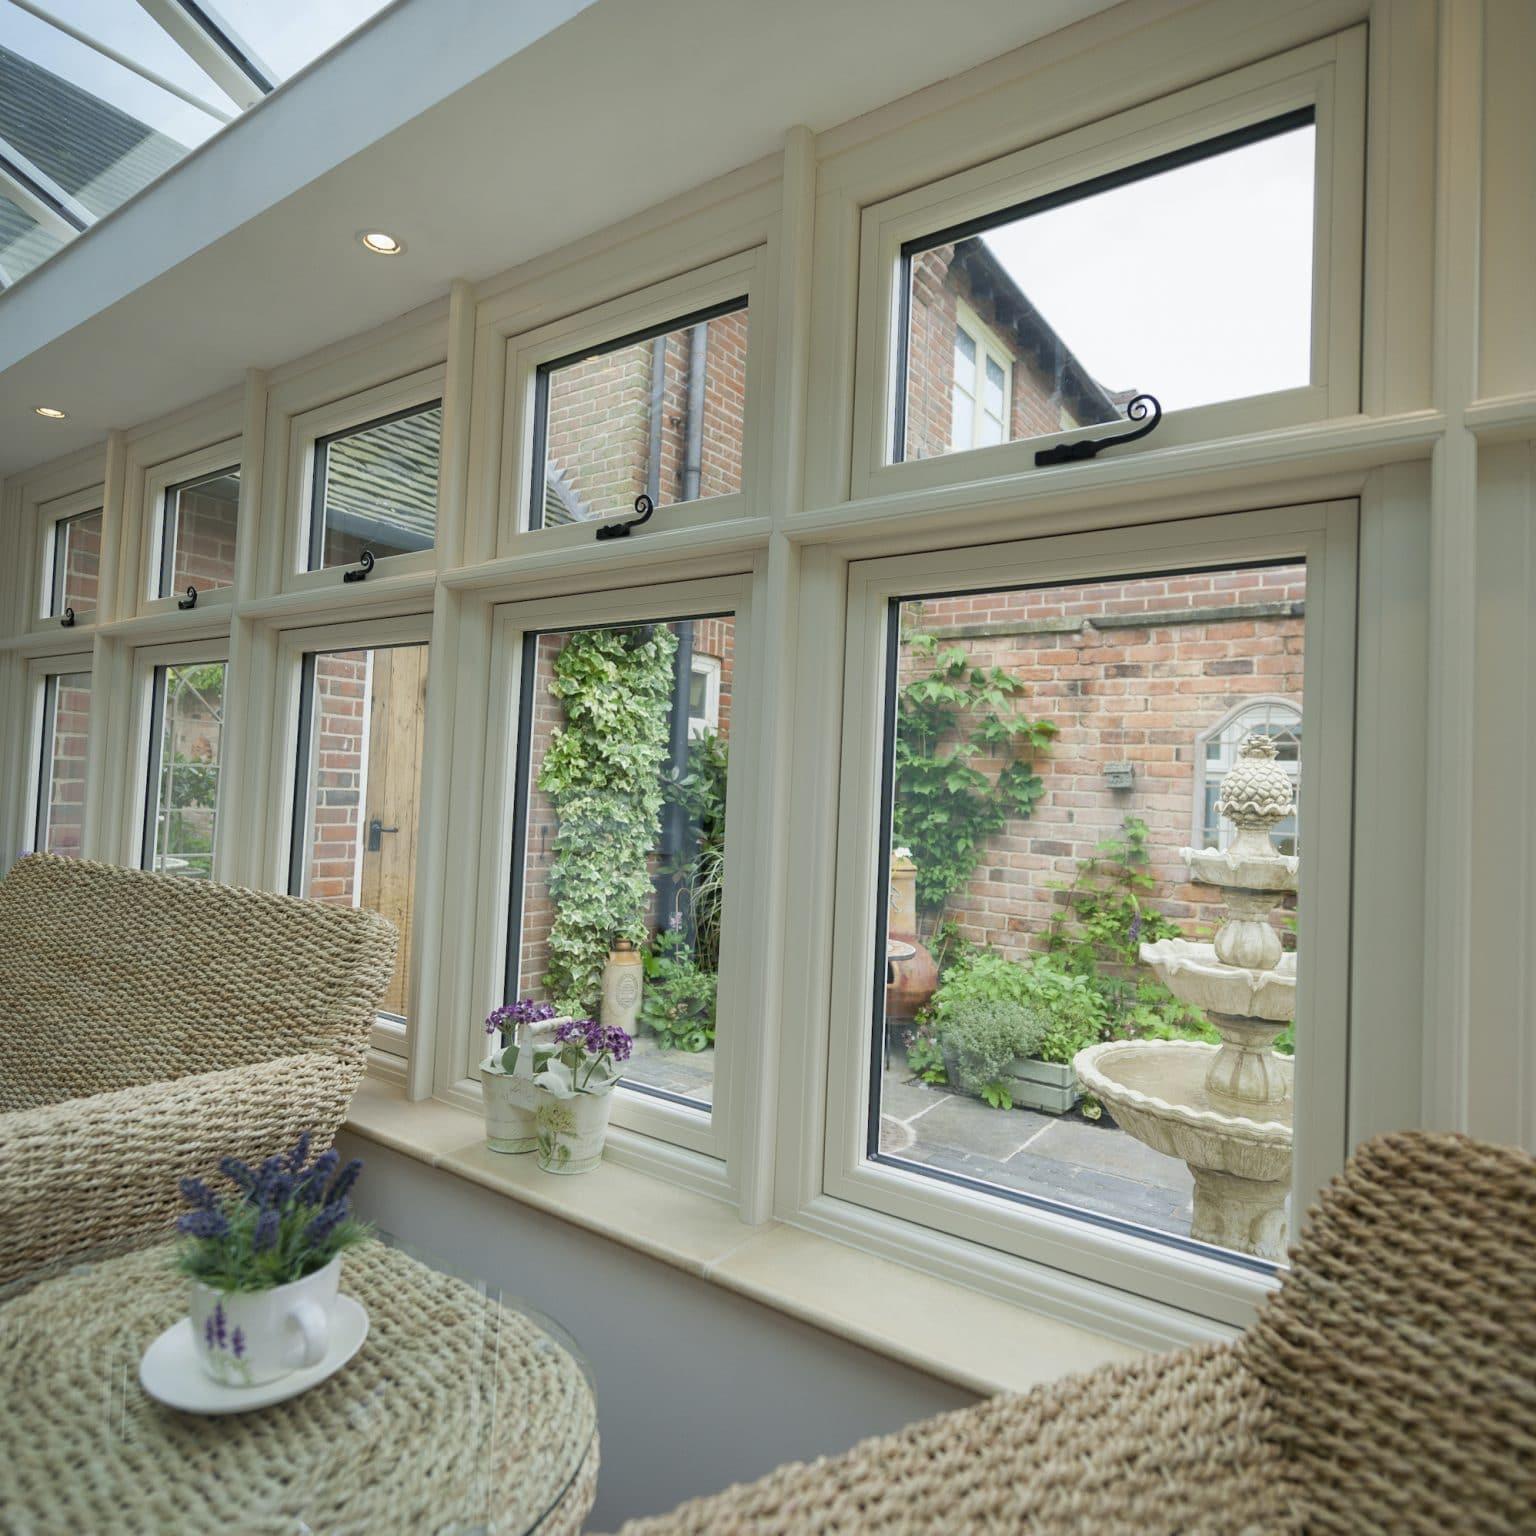 residence 9 windows in cream colour